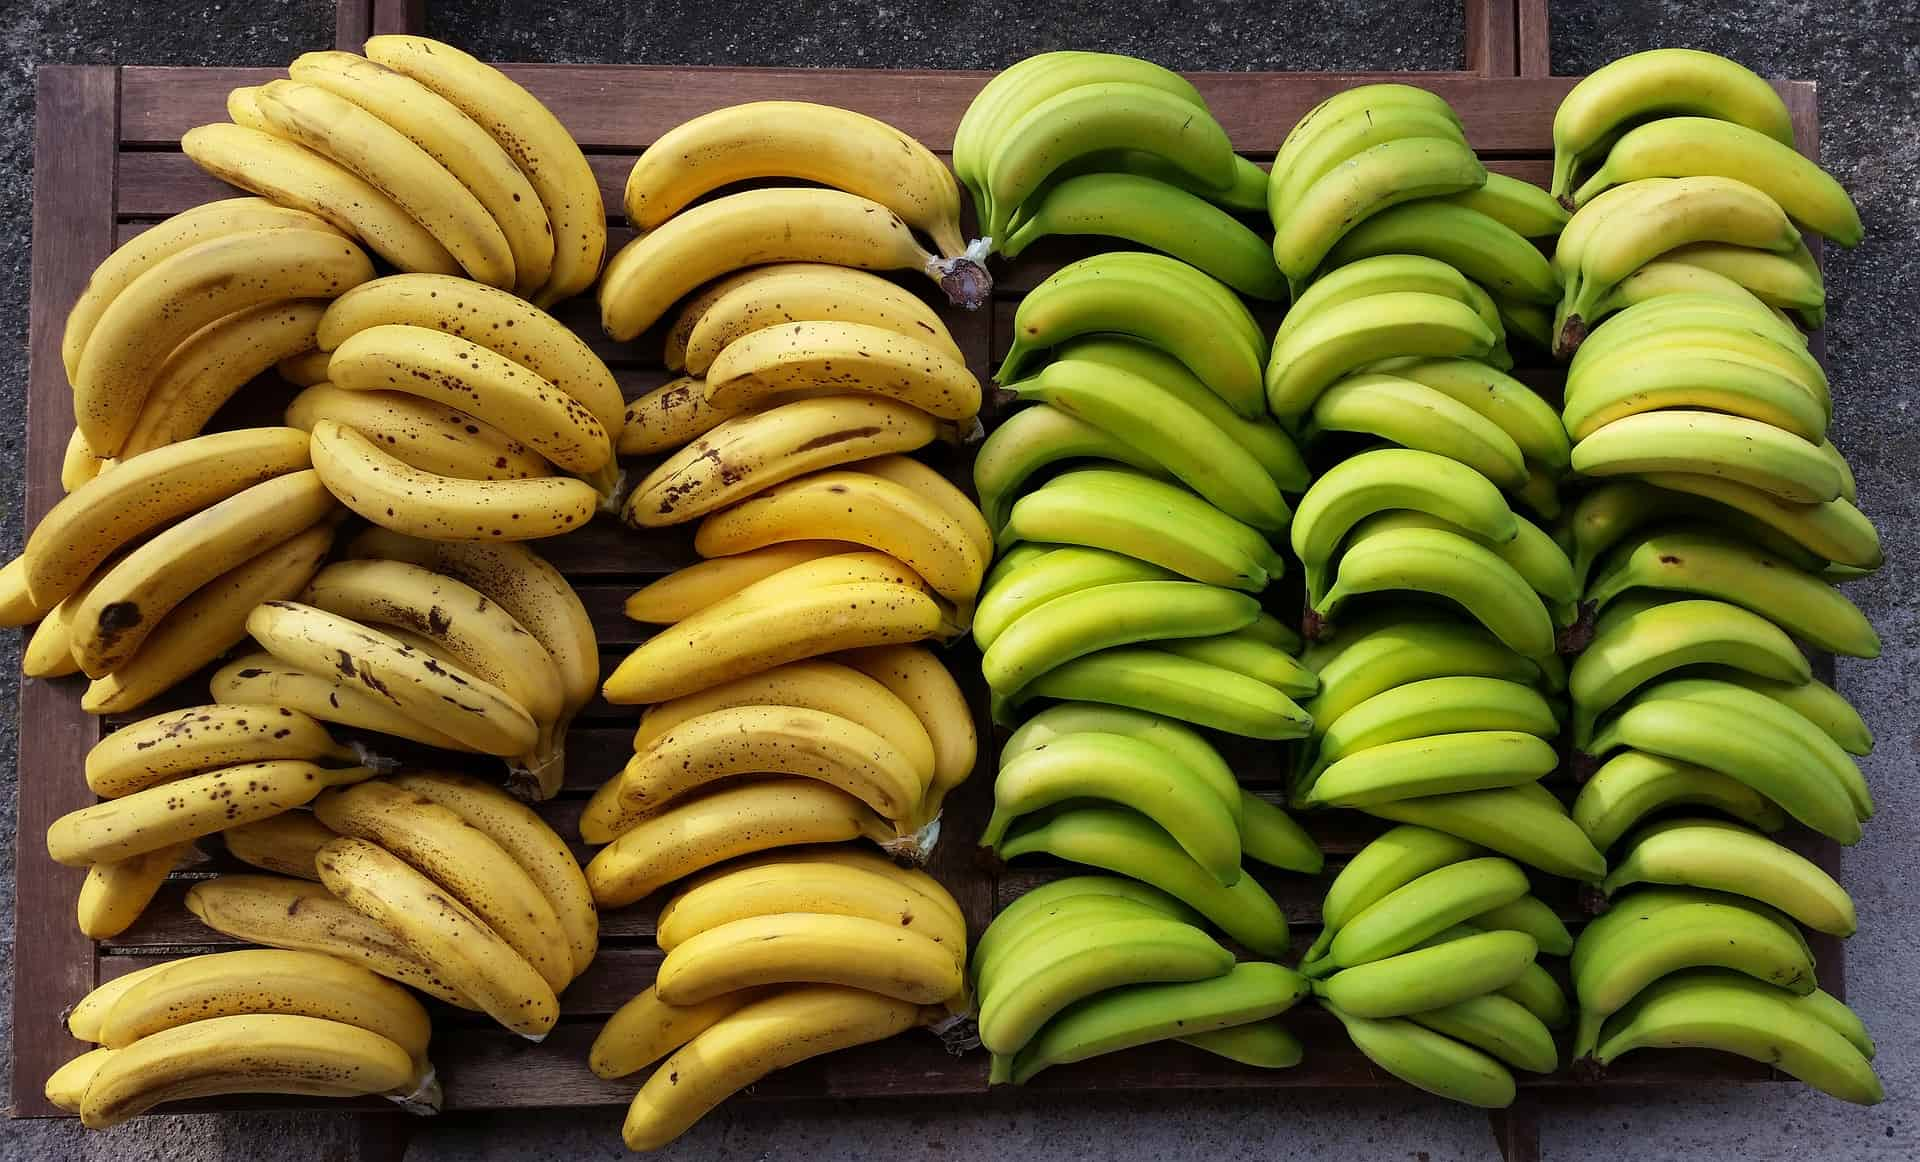 Gas etileno: La hormona para madurar las frutas ⋆ Larousse Cocina